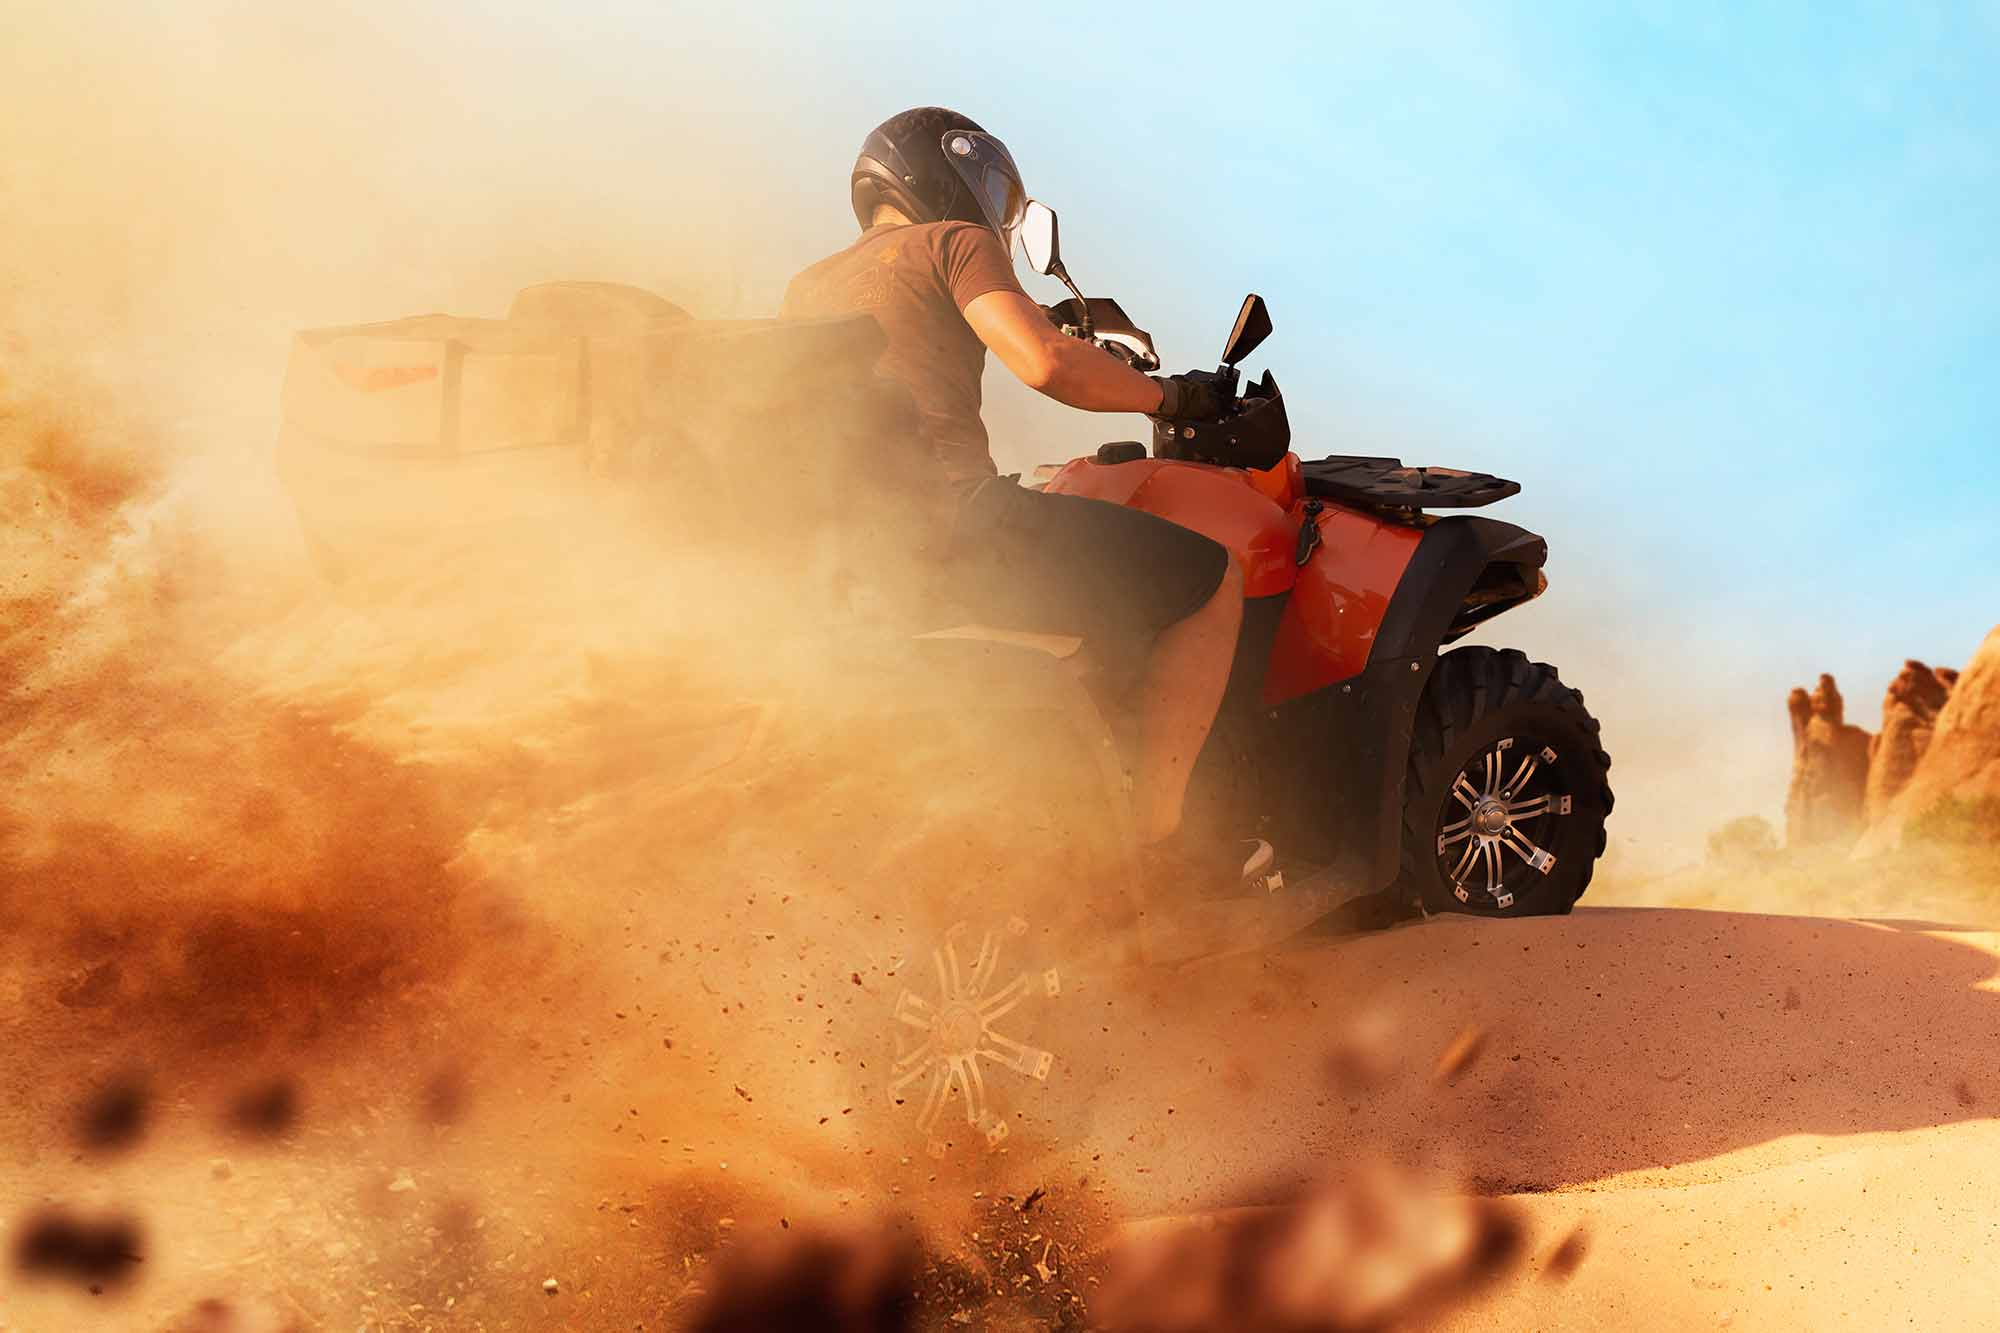 atv-riding-in-sand-quarry-dust-clouds-quad-bike-HKBLRZY